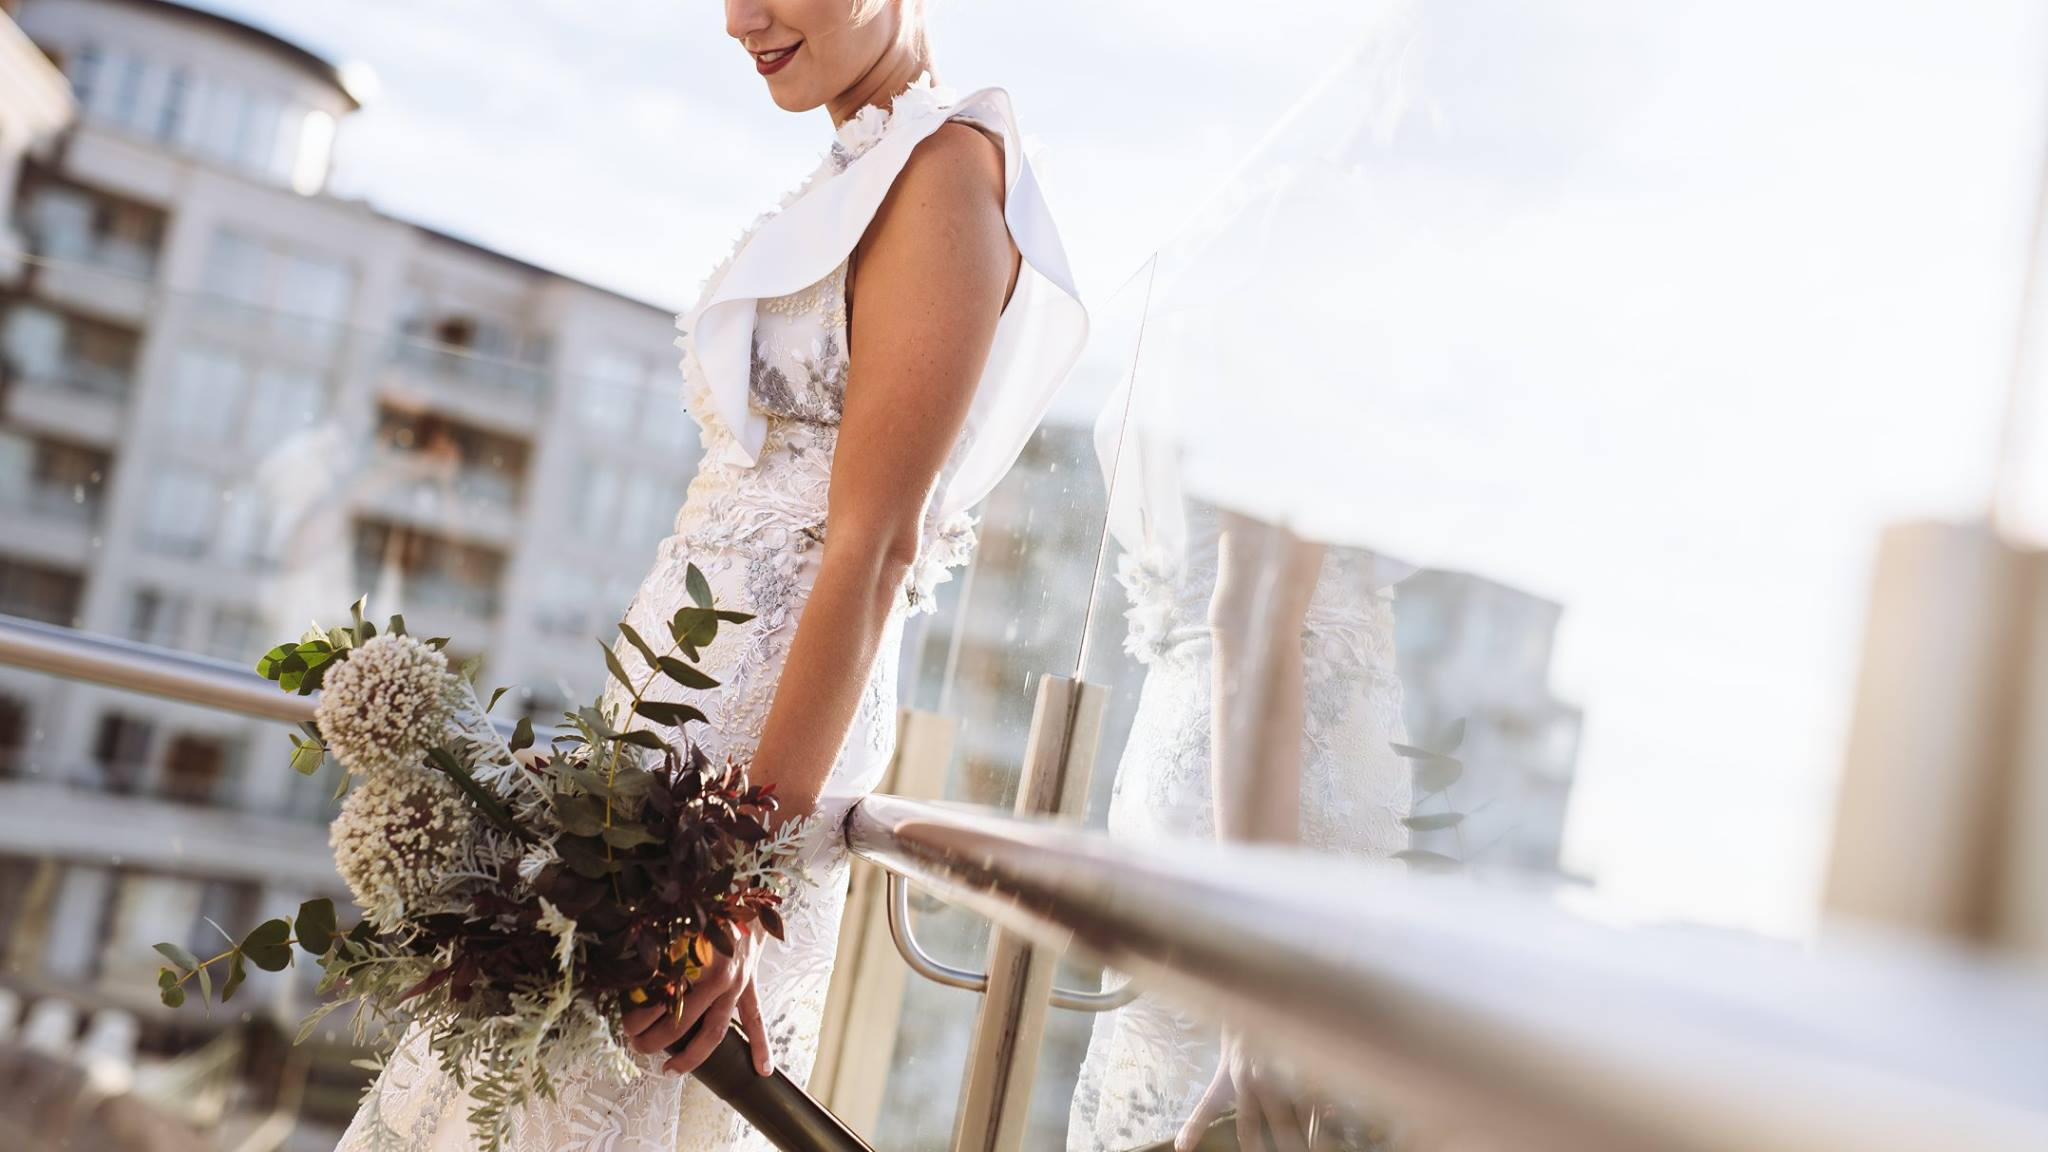 Arpilar Weddings_Esteban Fernandez_Finca Madero Ombu_Piru y Jere_13 copia